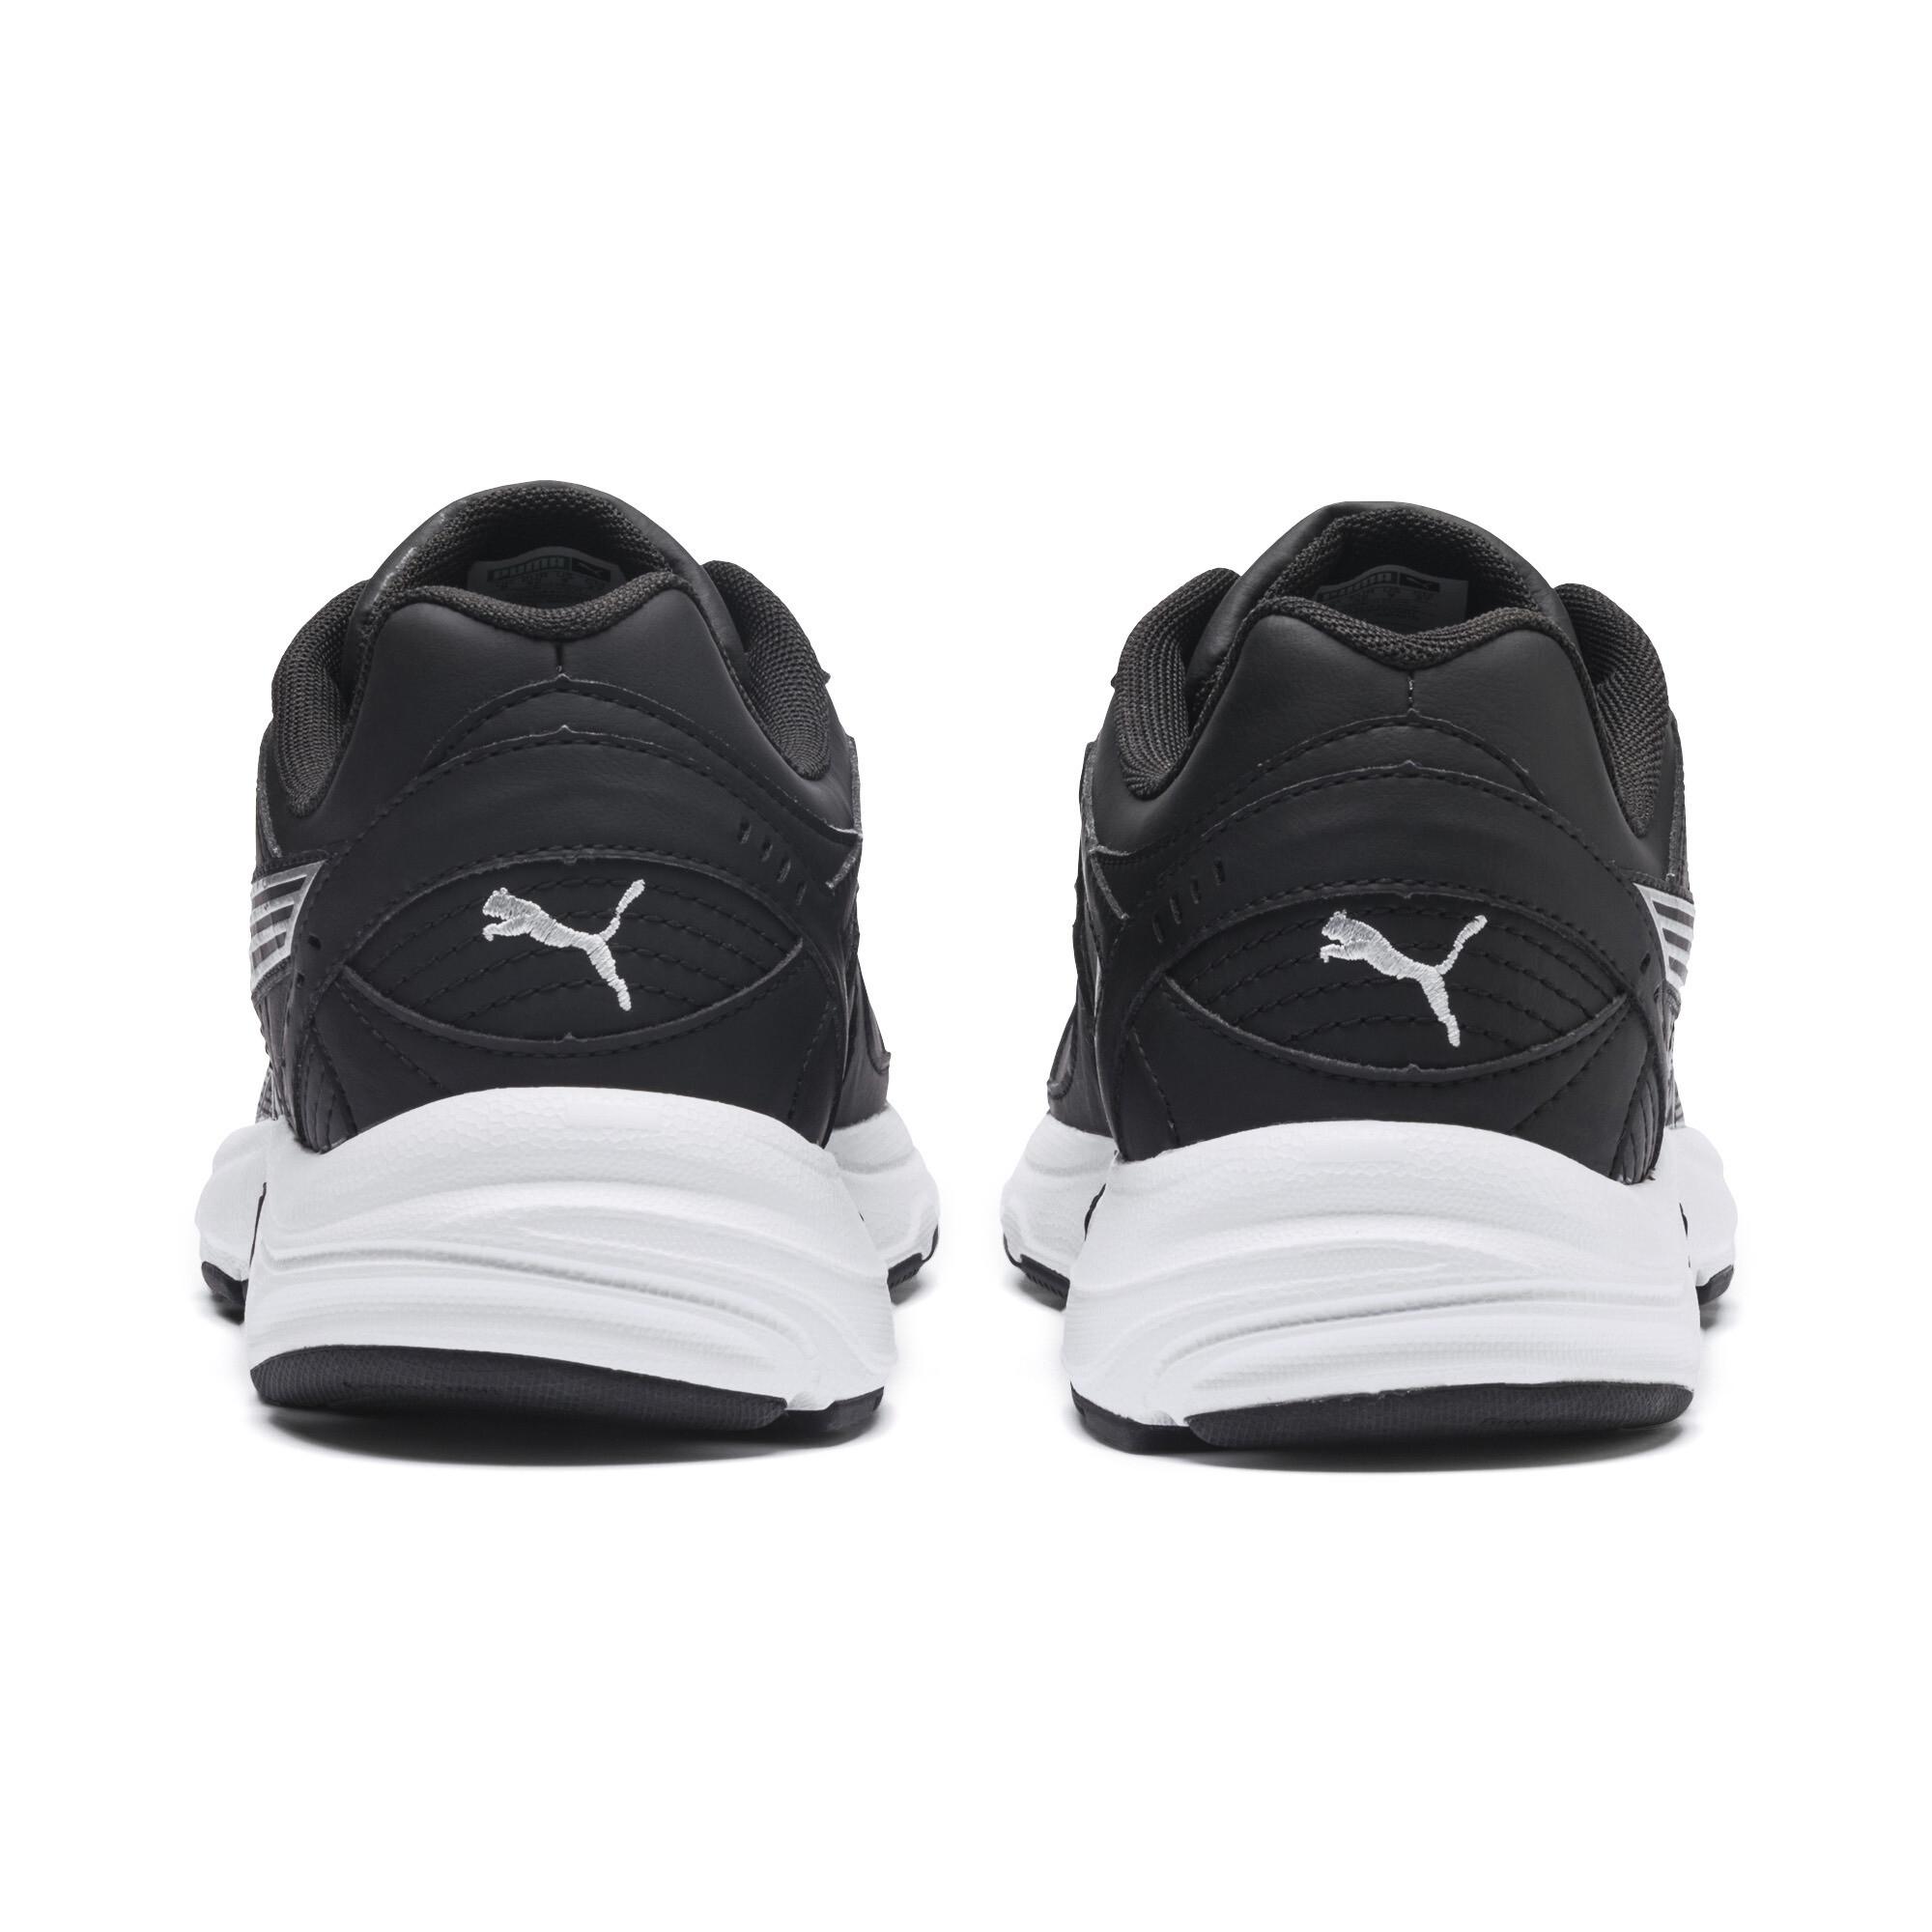 PUMA-Men-039-s-Axis-SL-Sneakers thumbnail 9